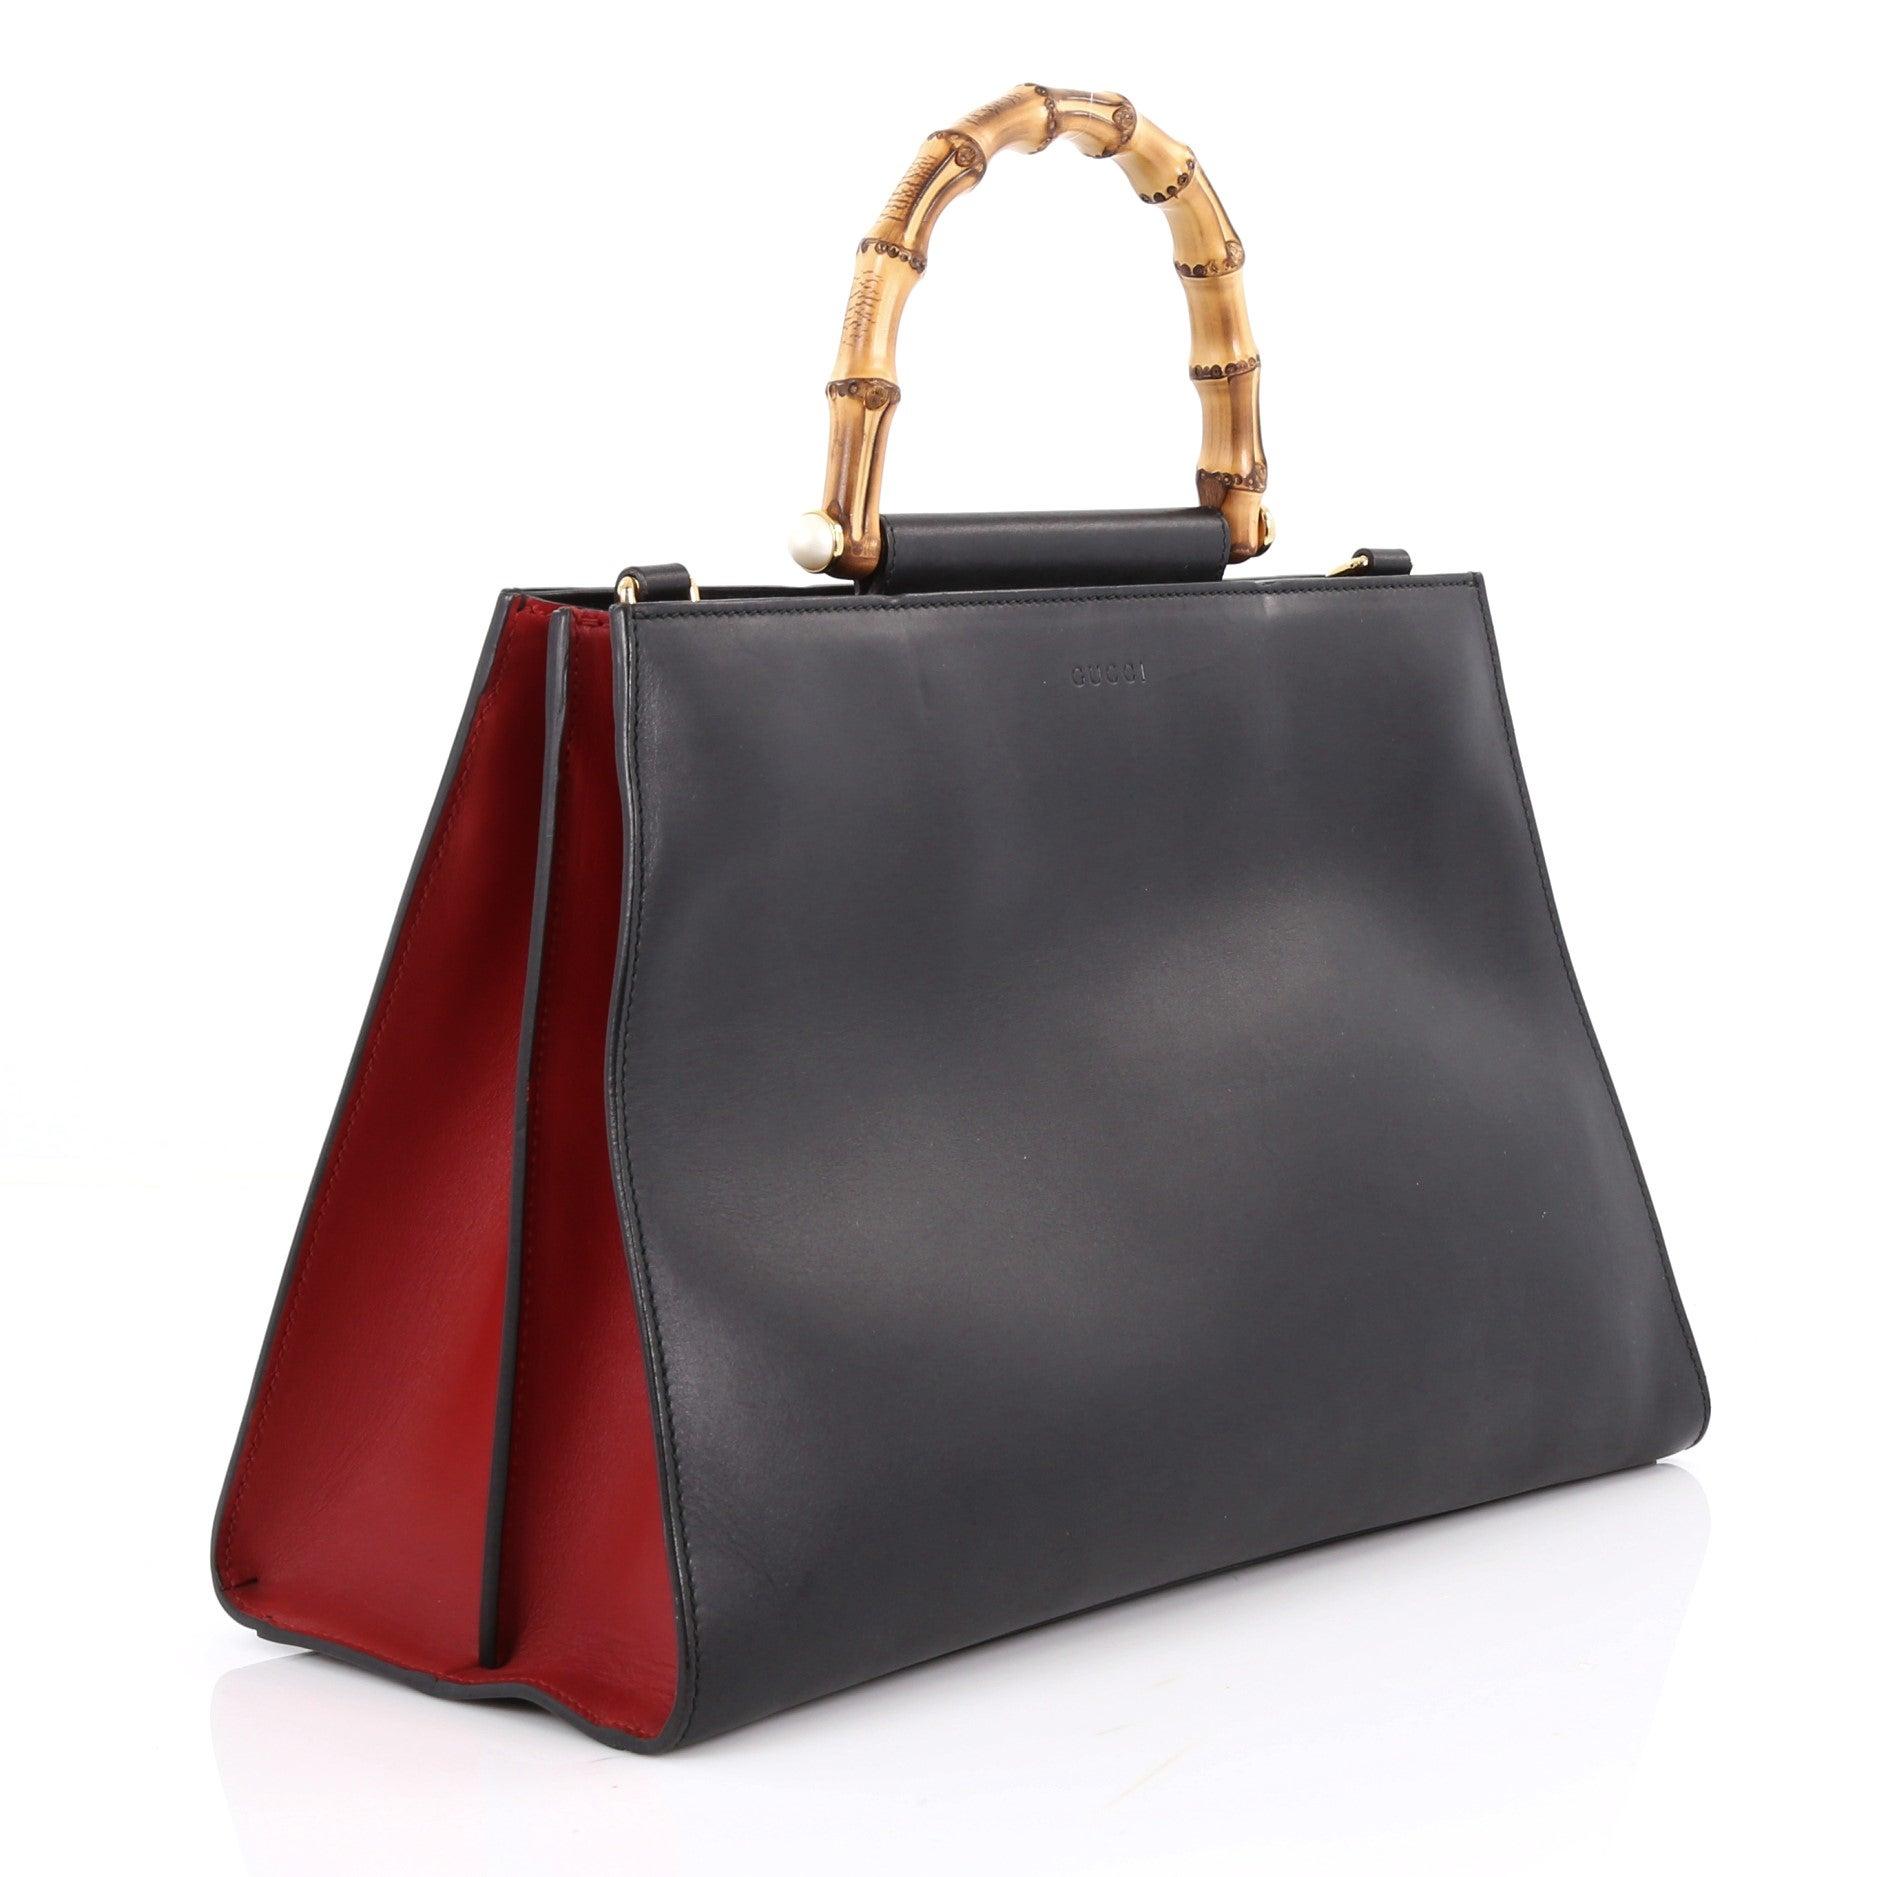 d63faf59cbc Gucci Nymphaea Top Handle Bag Leather Medium at 1stdibs